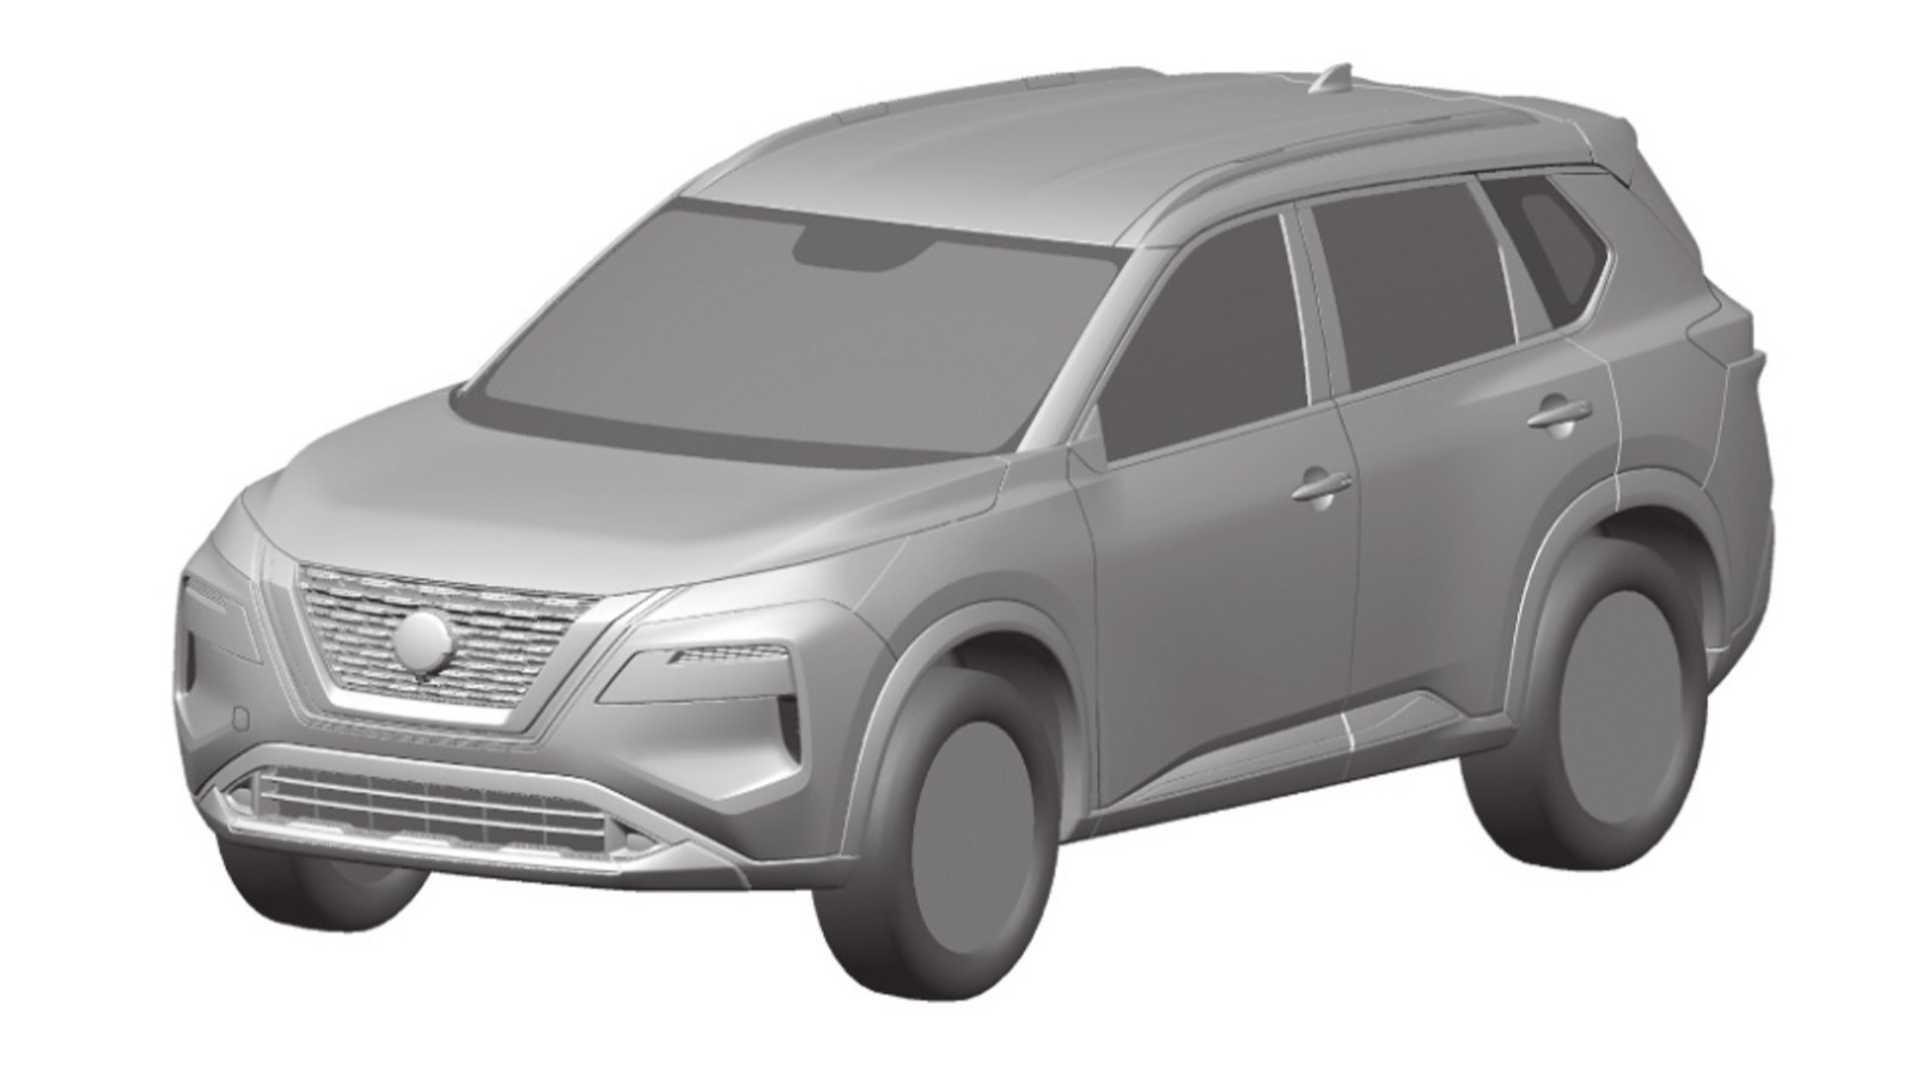 Posibles bocetos Nissan X-Trail 2020